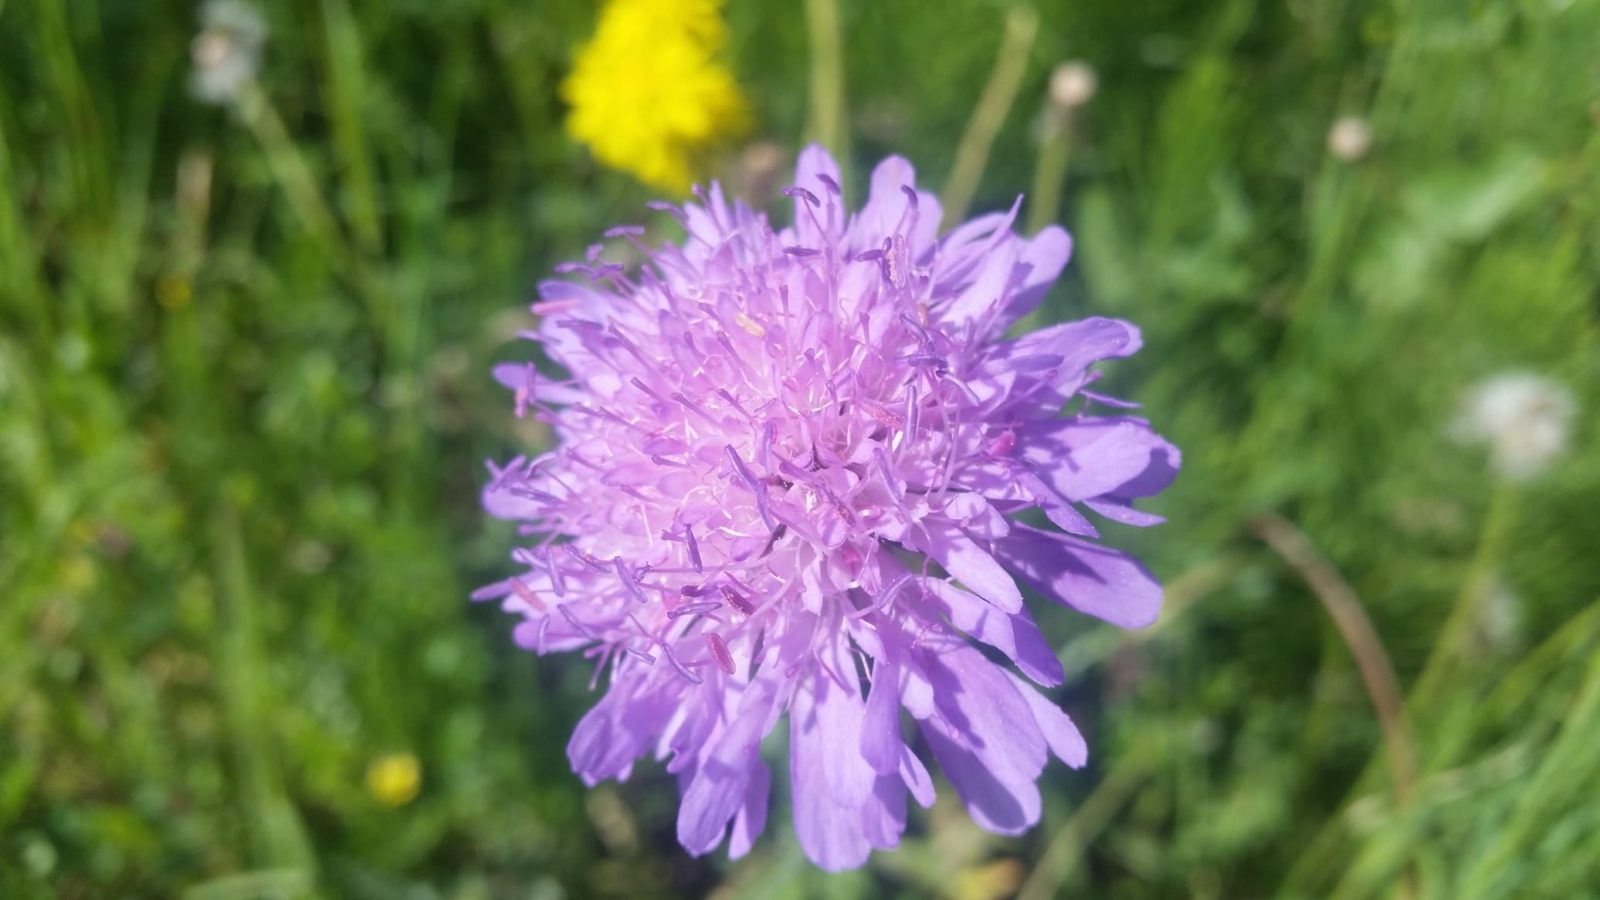 purple scabiosa pincushion flower